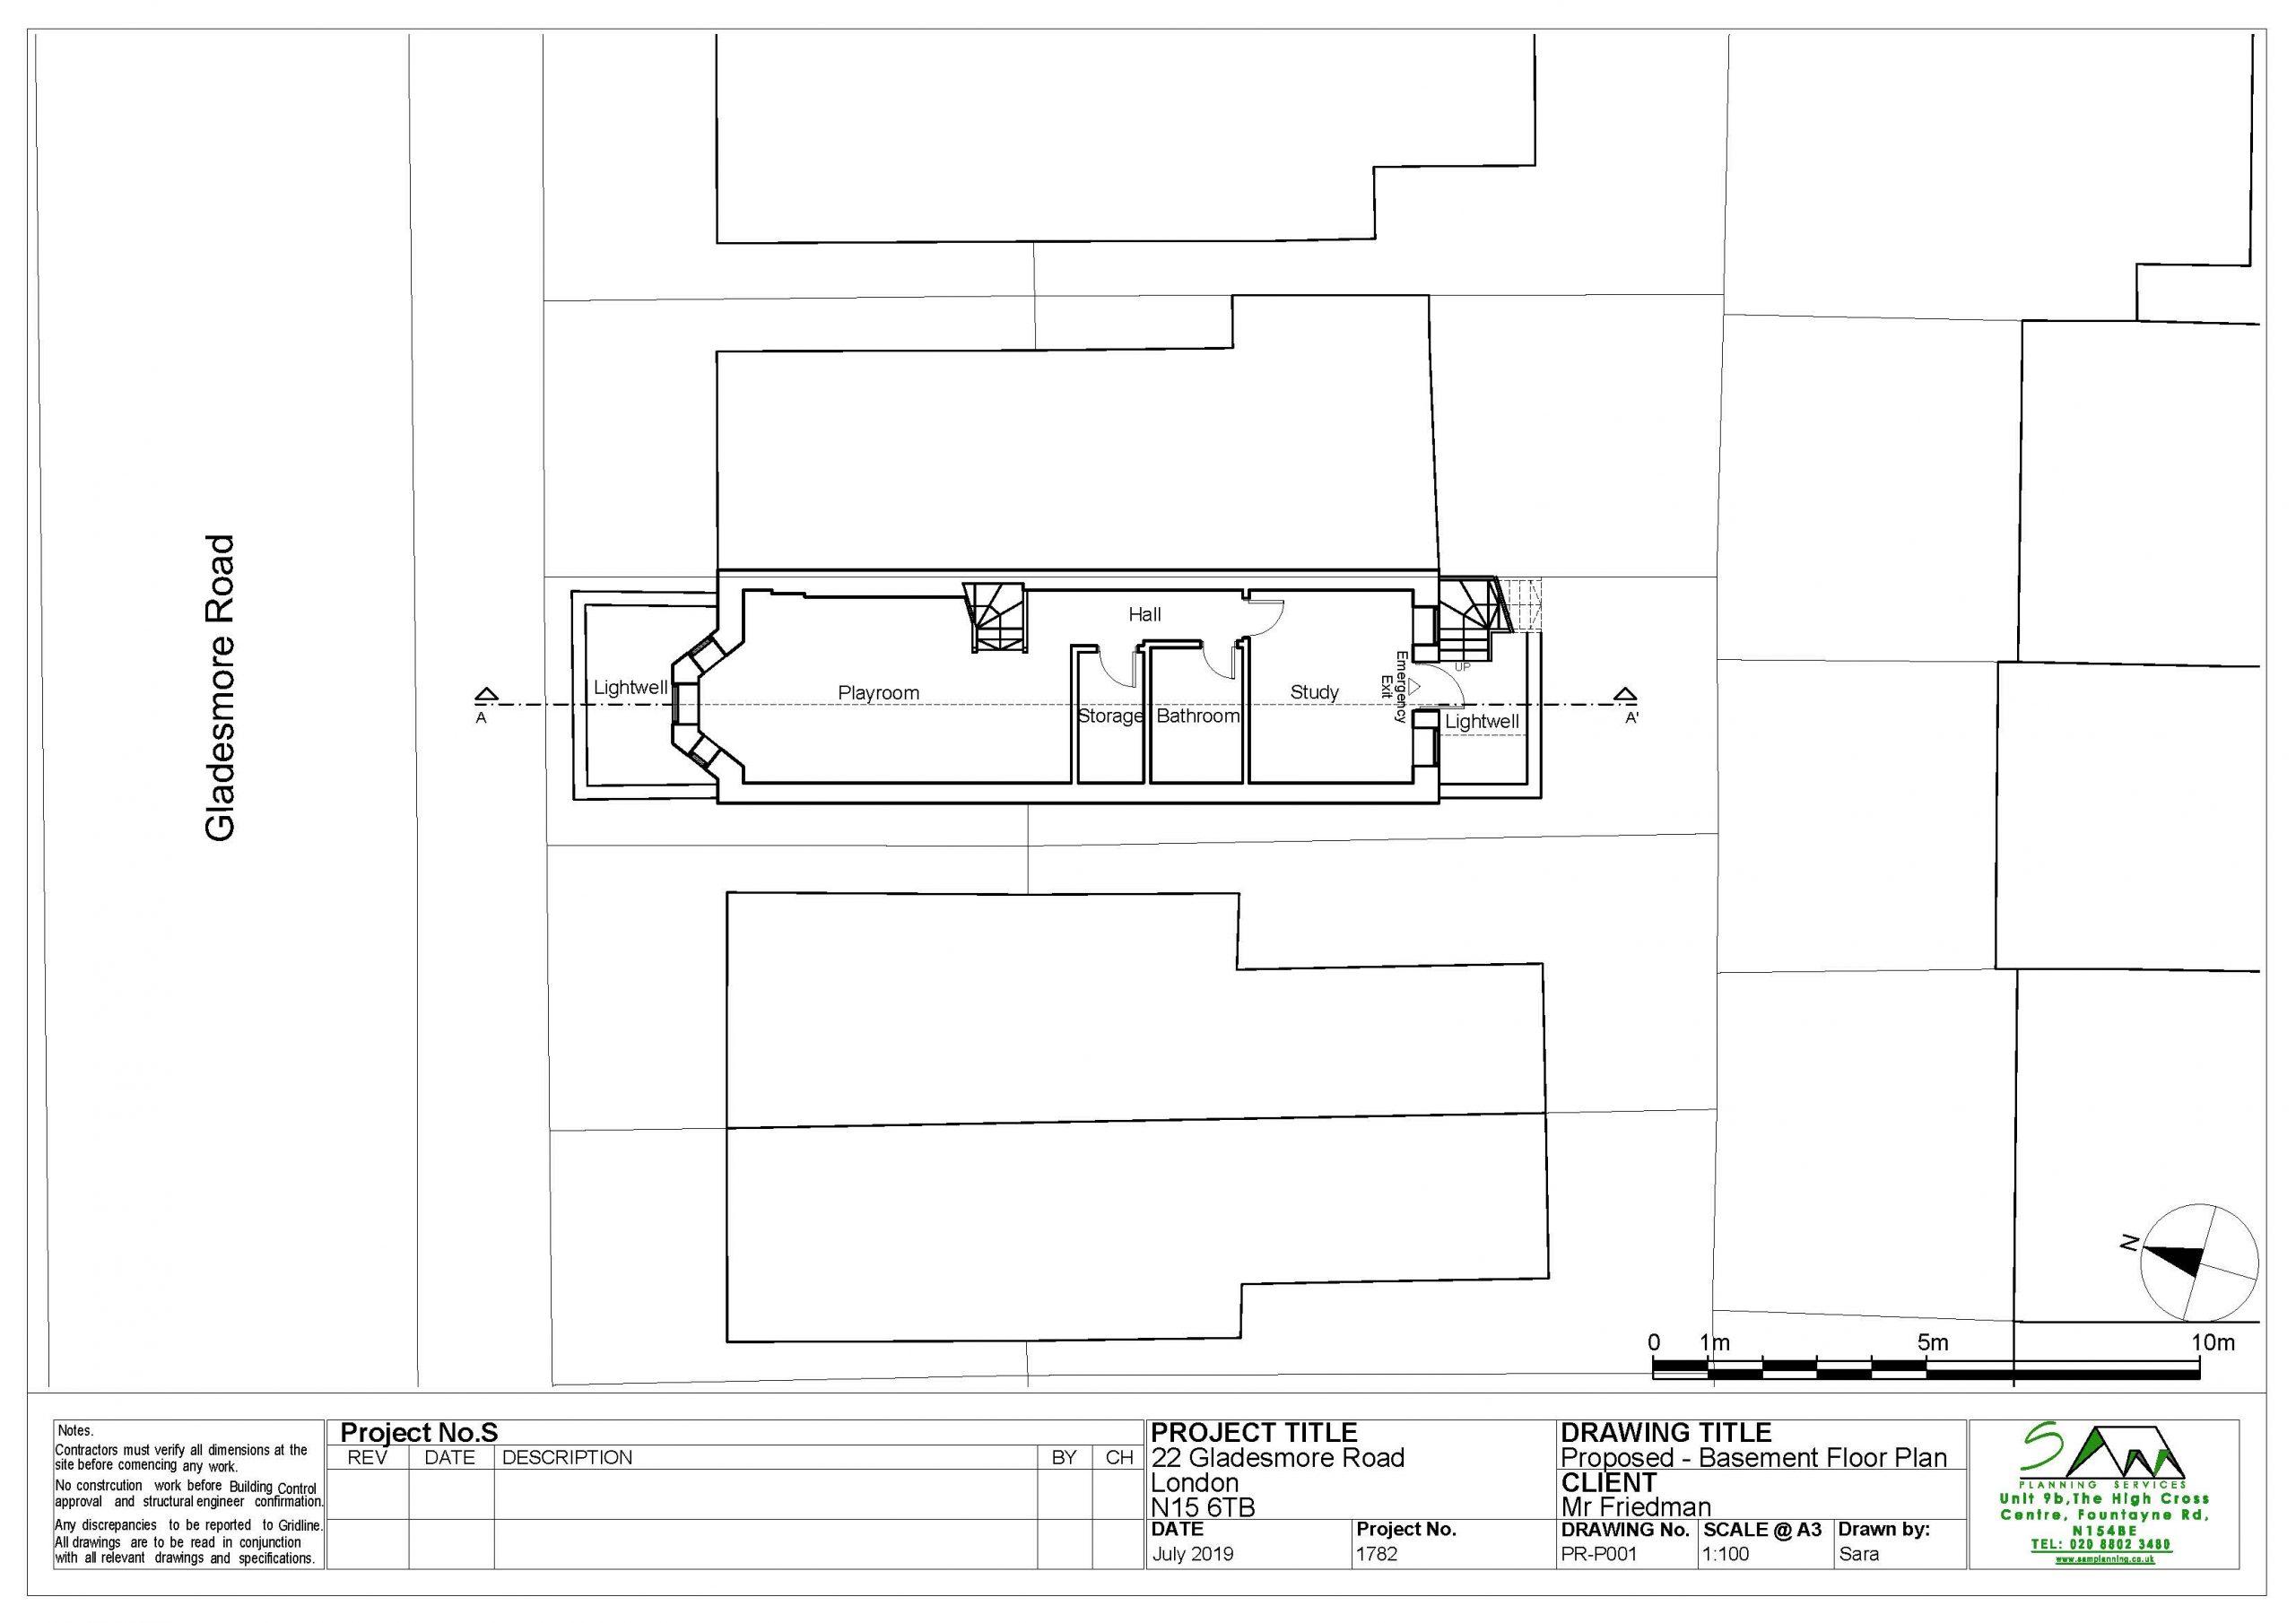 22gladesmoreProposed Basement Floor Plan